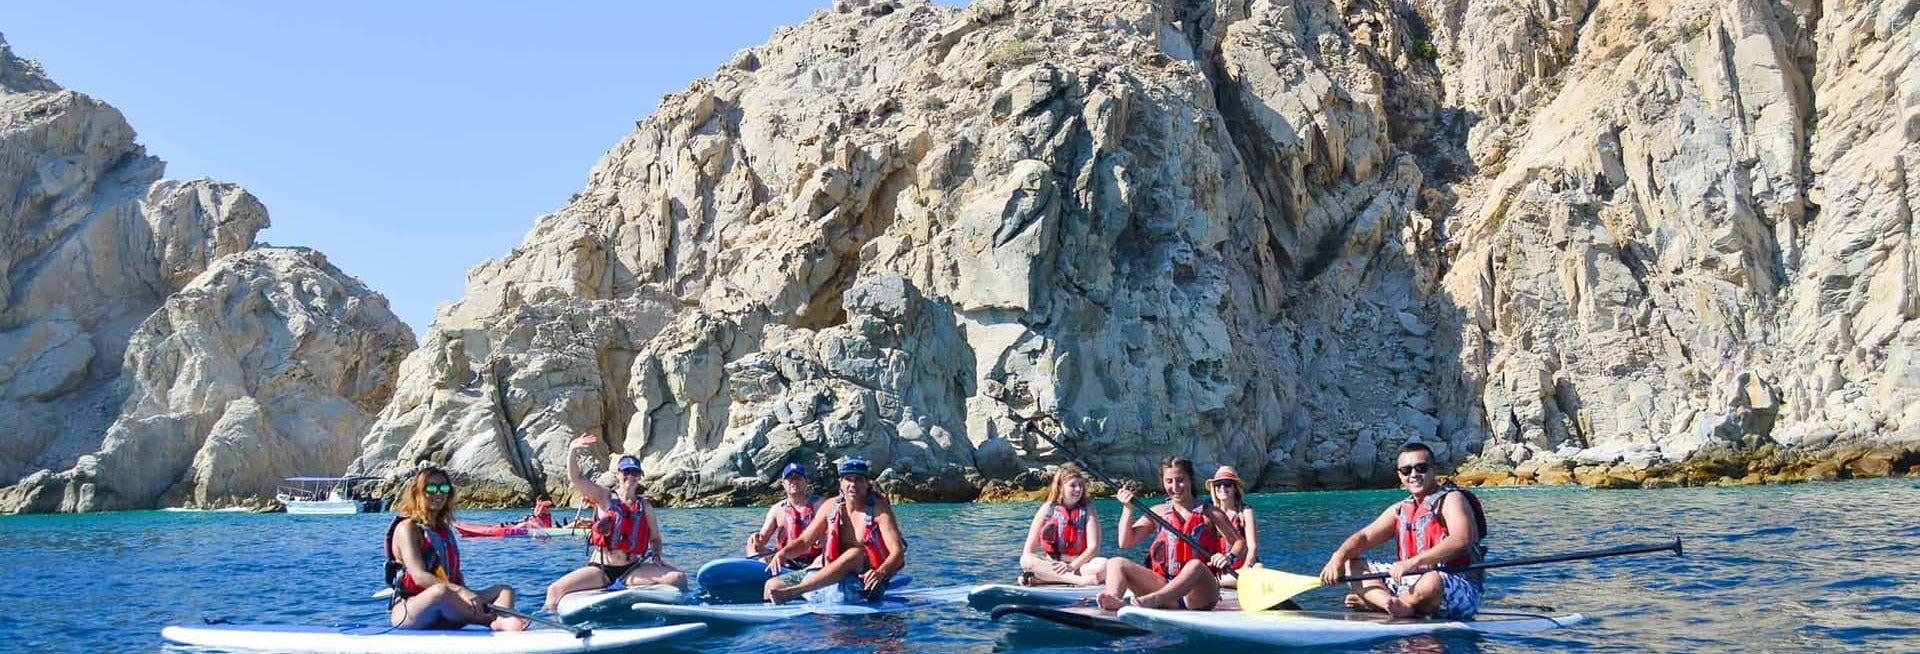 Snorkel e paddle surf em Los Cabos